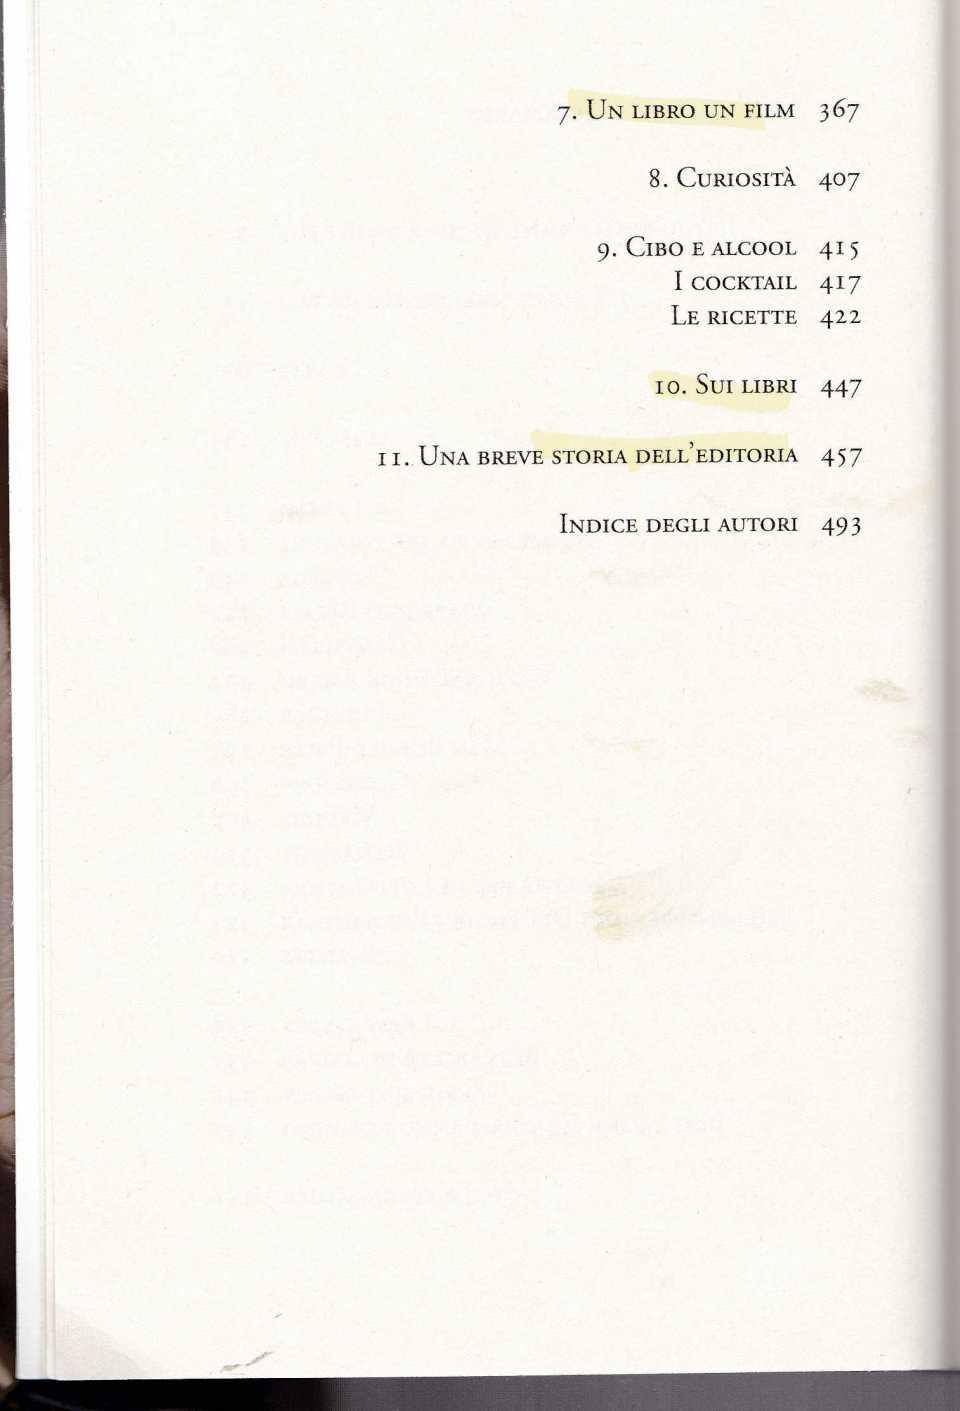 maniaci libri1790